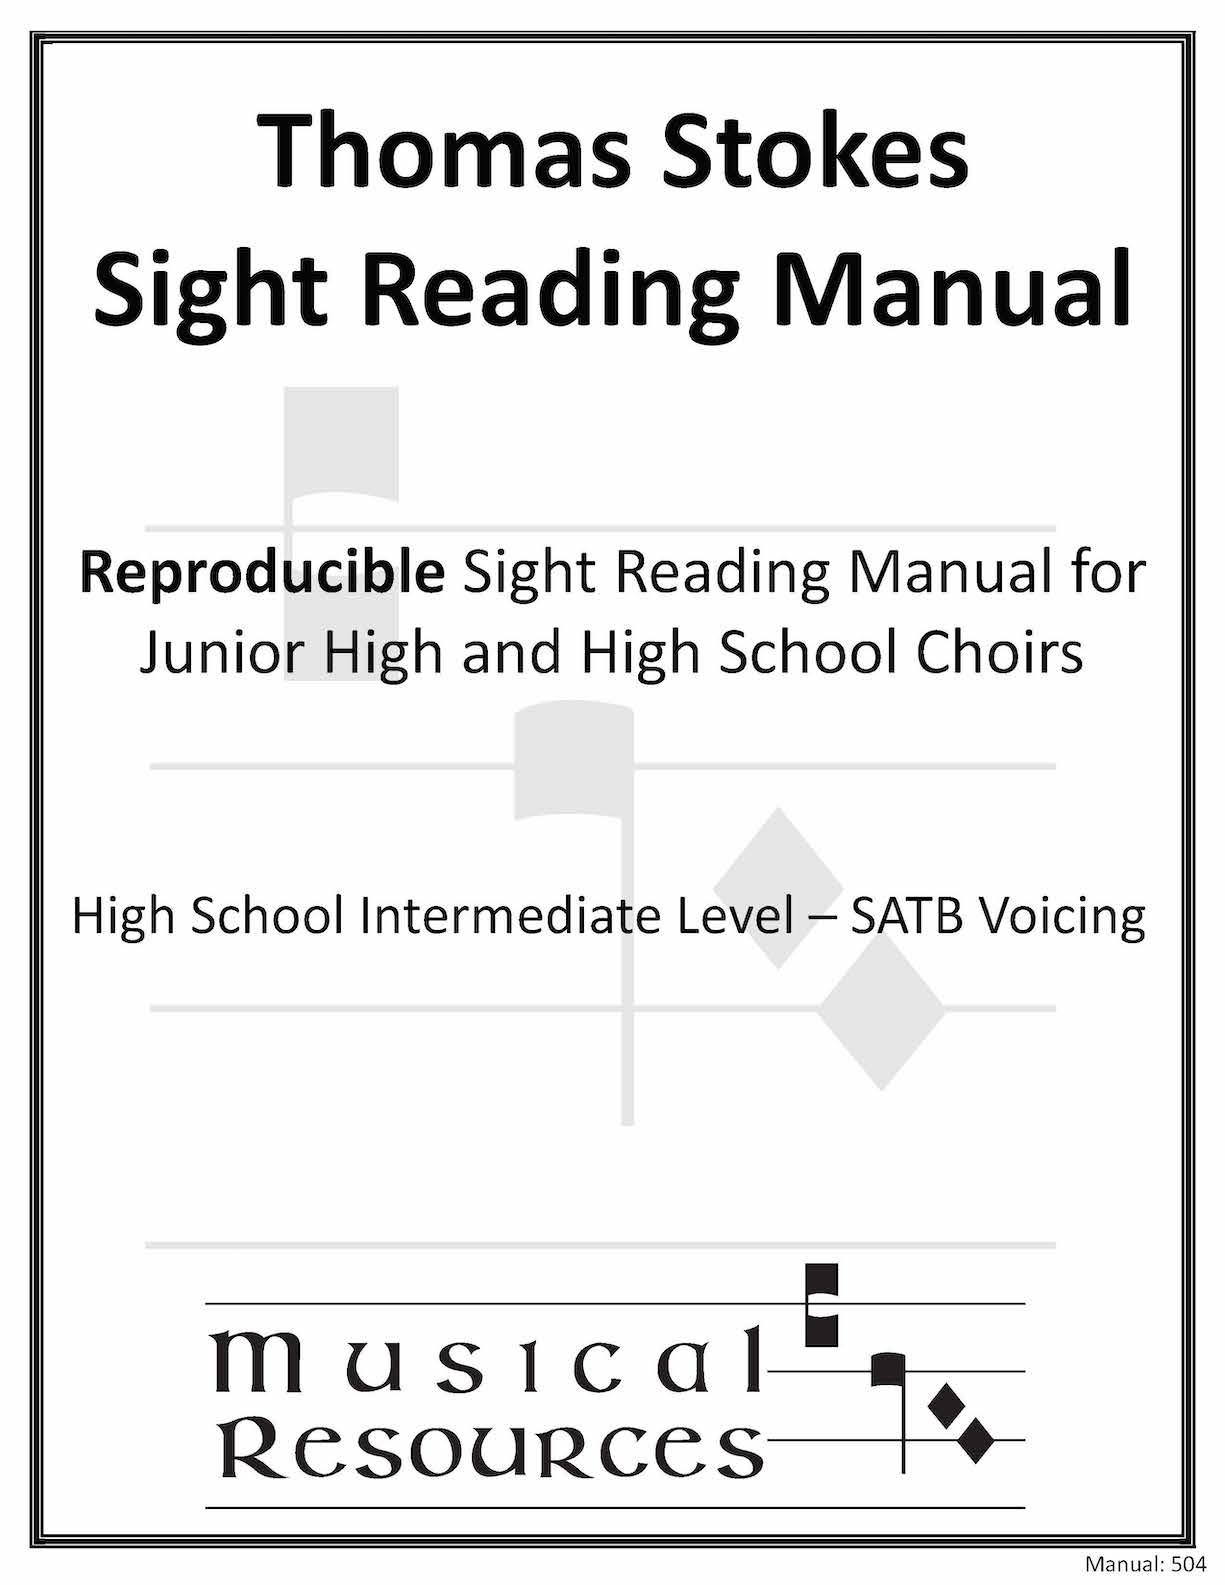 Picture of (Digital) Thomas Stokes Sightreading Manual #504 - SATB High School Intermediate